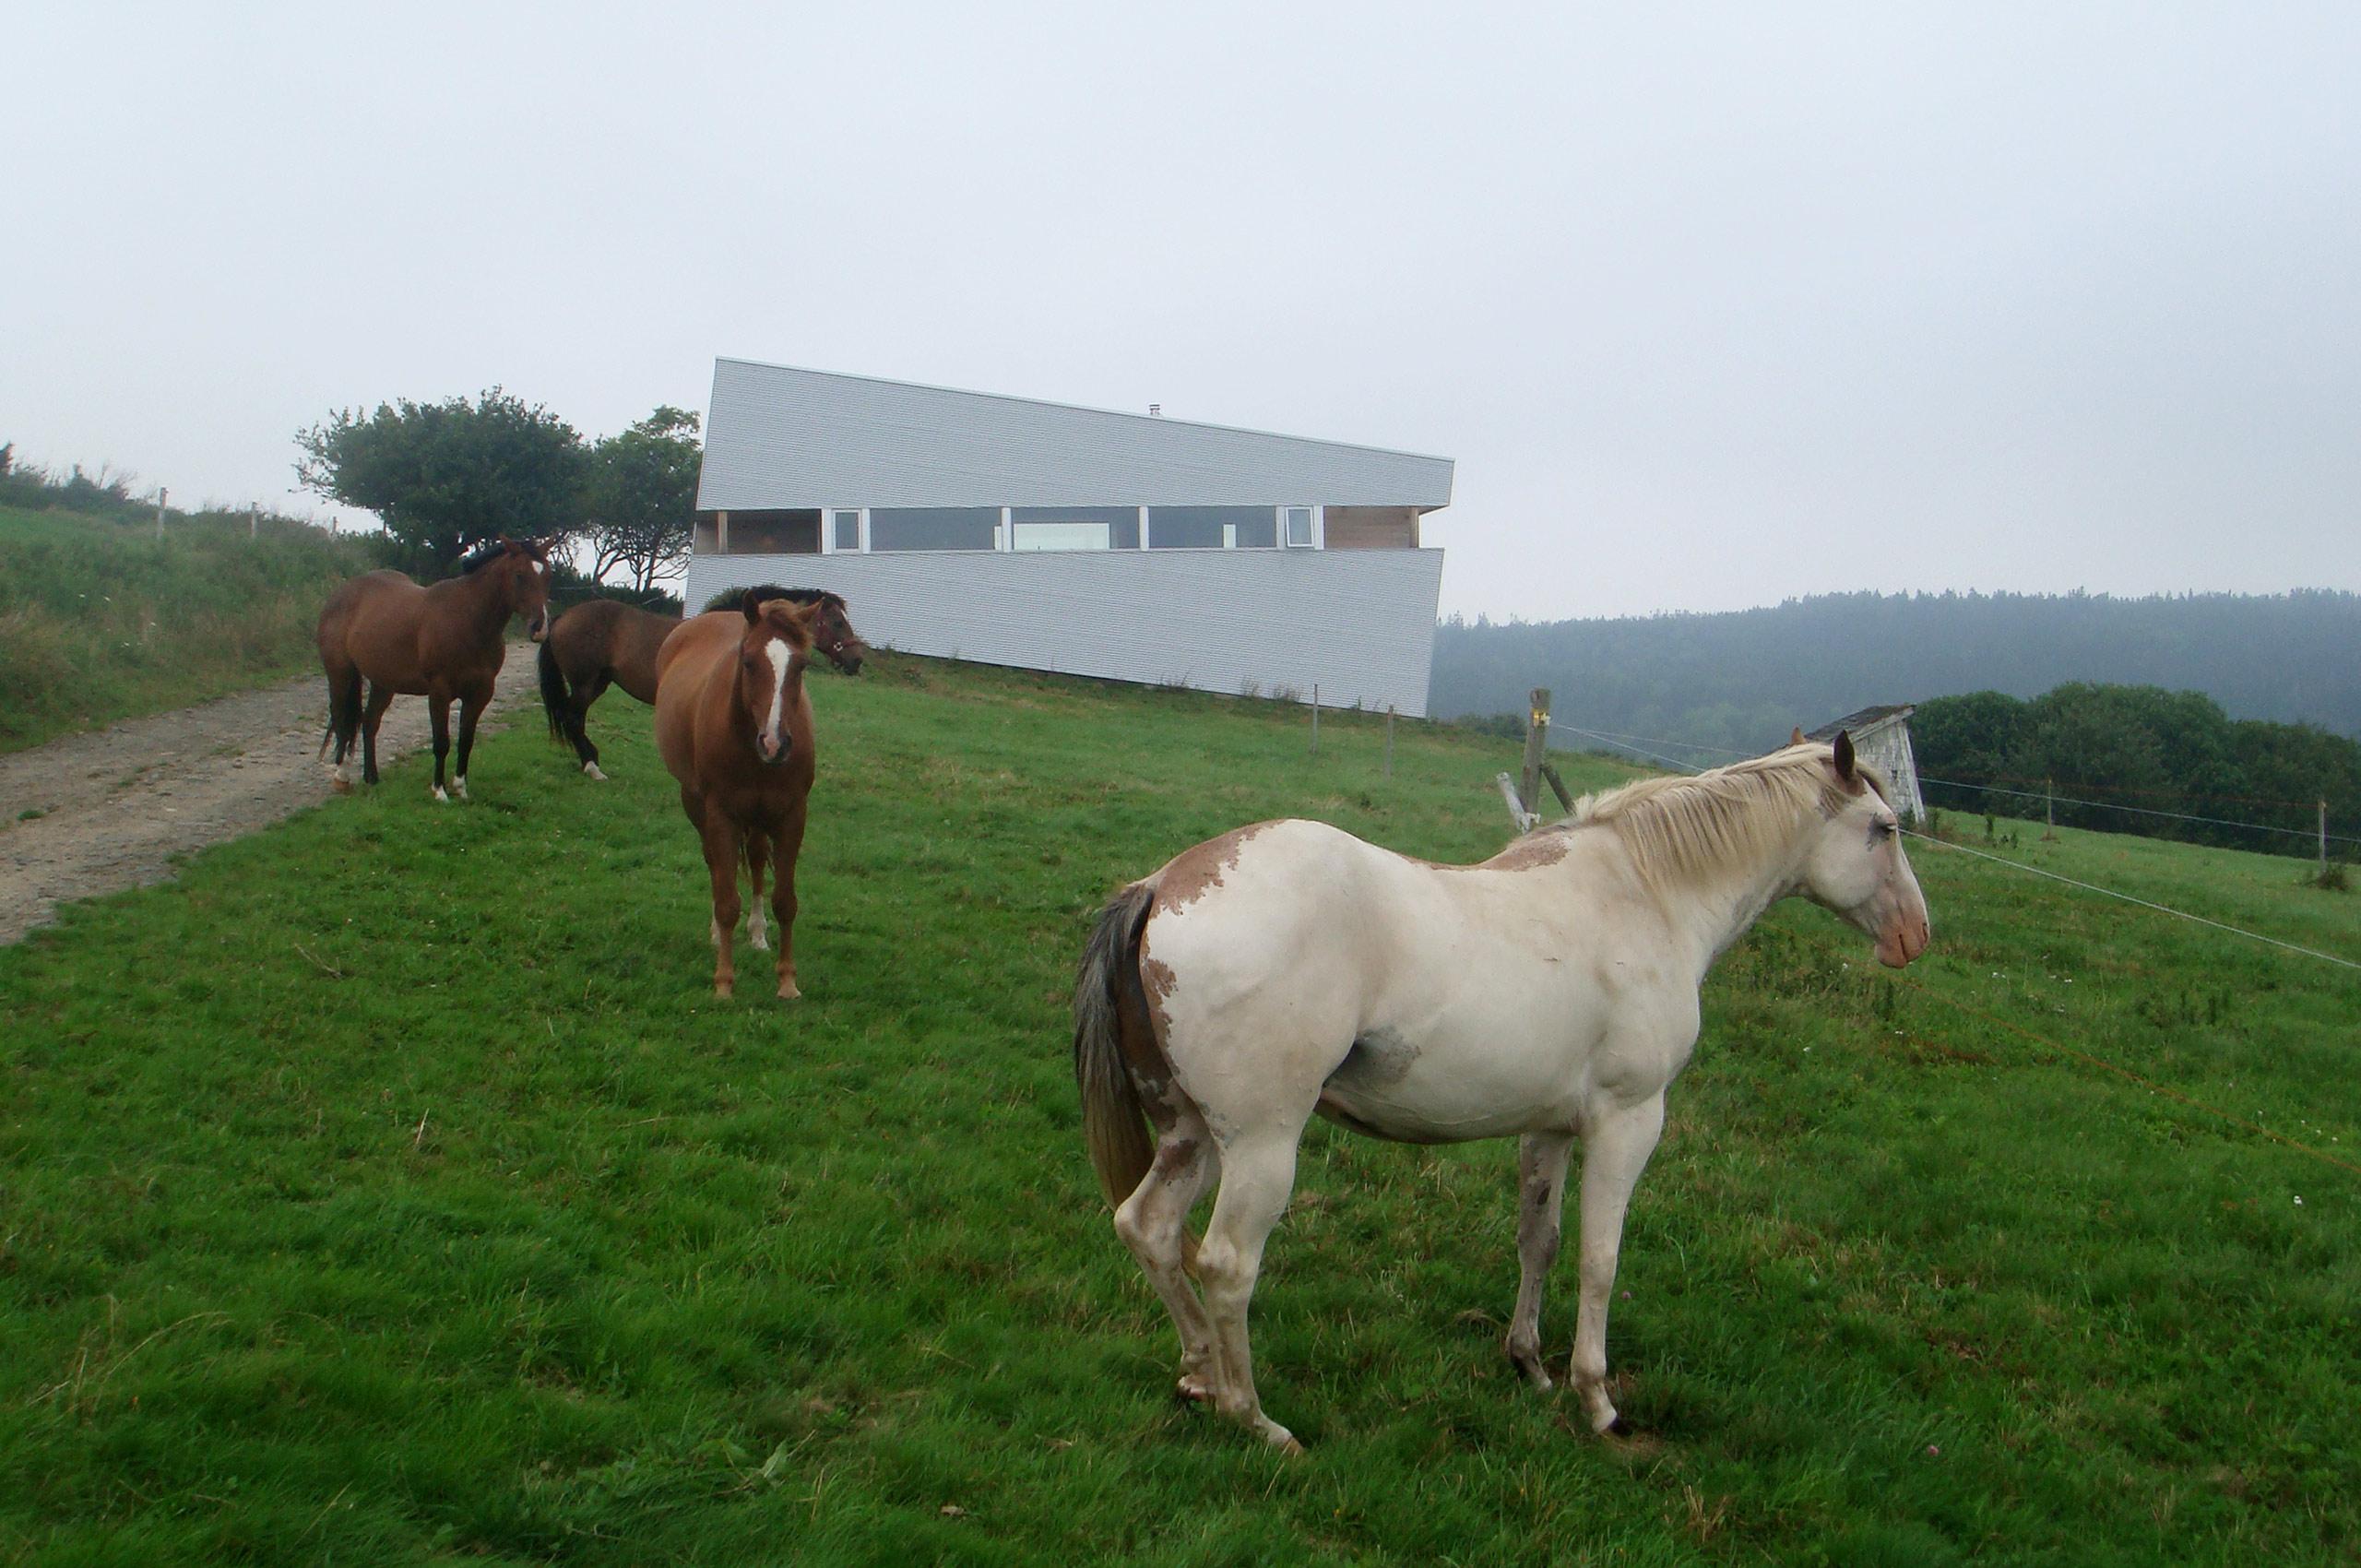 02_horses_2560x1700_66quality.jpg